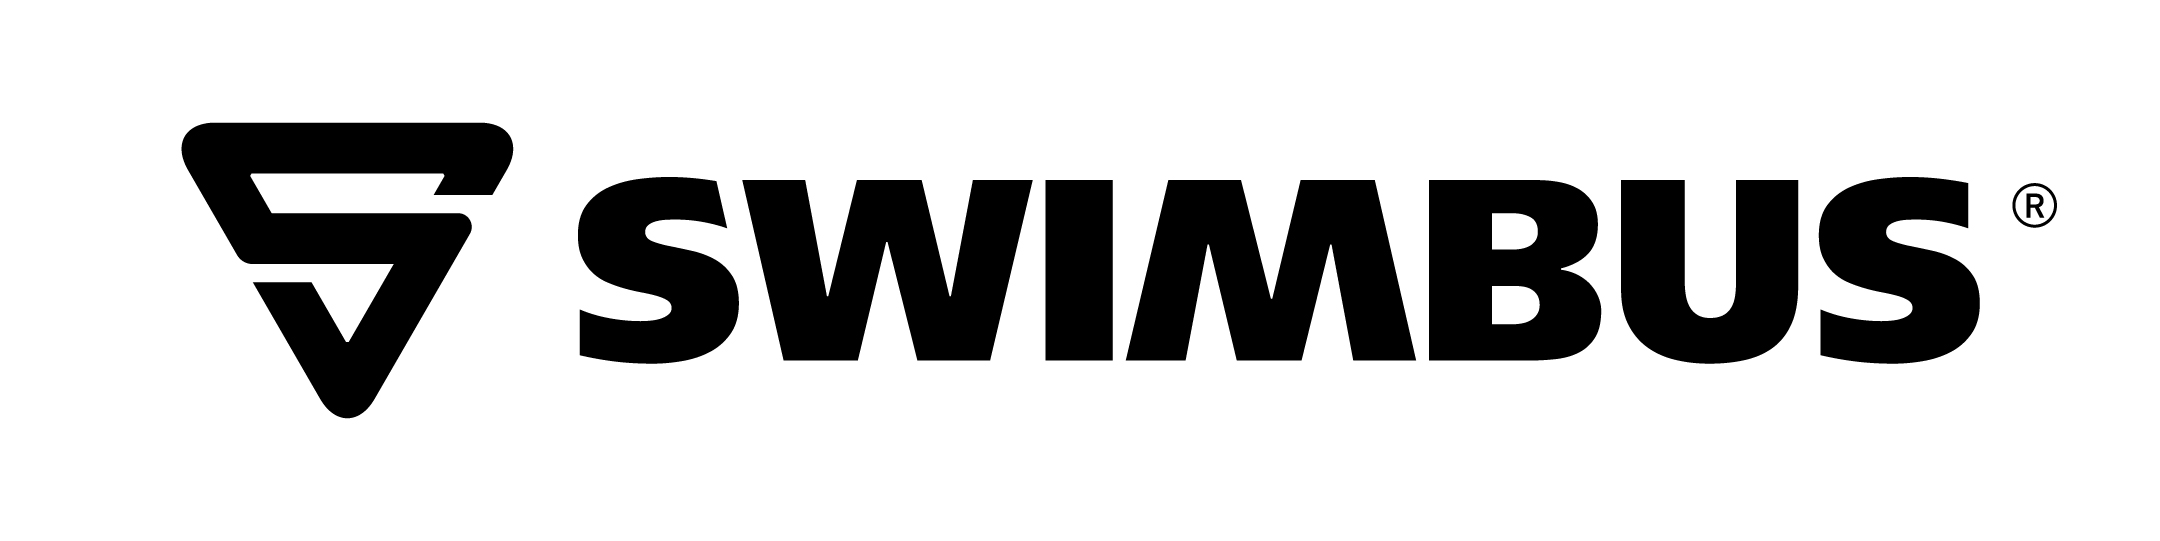 Swimbus